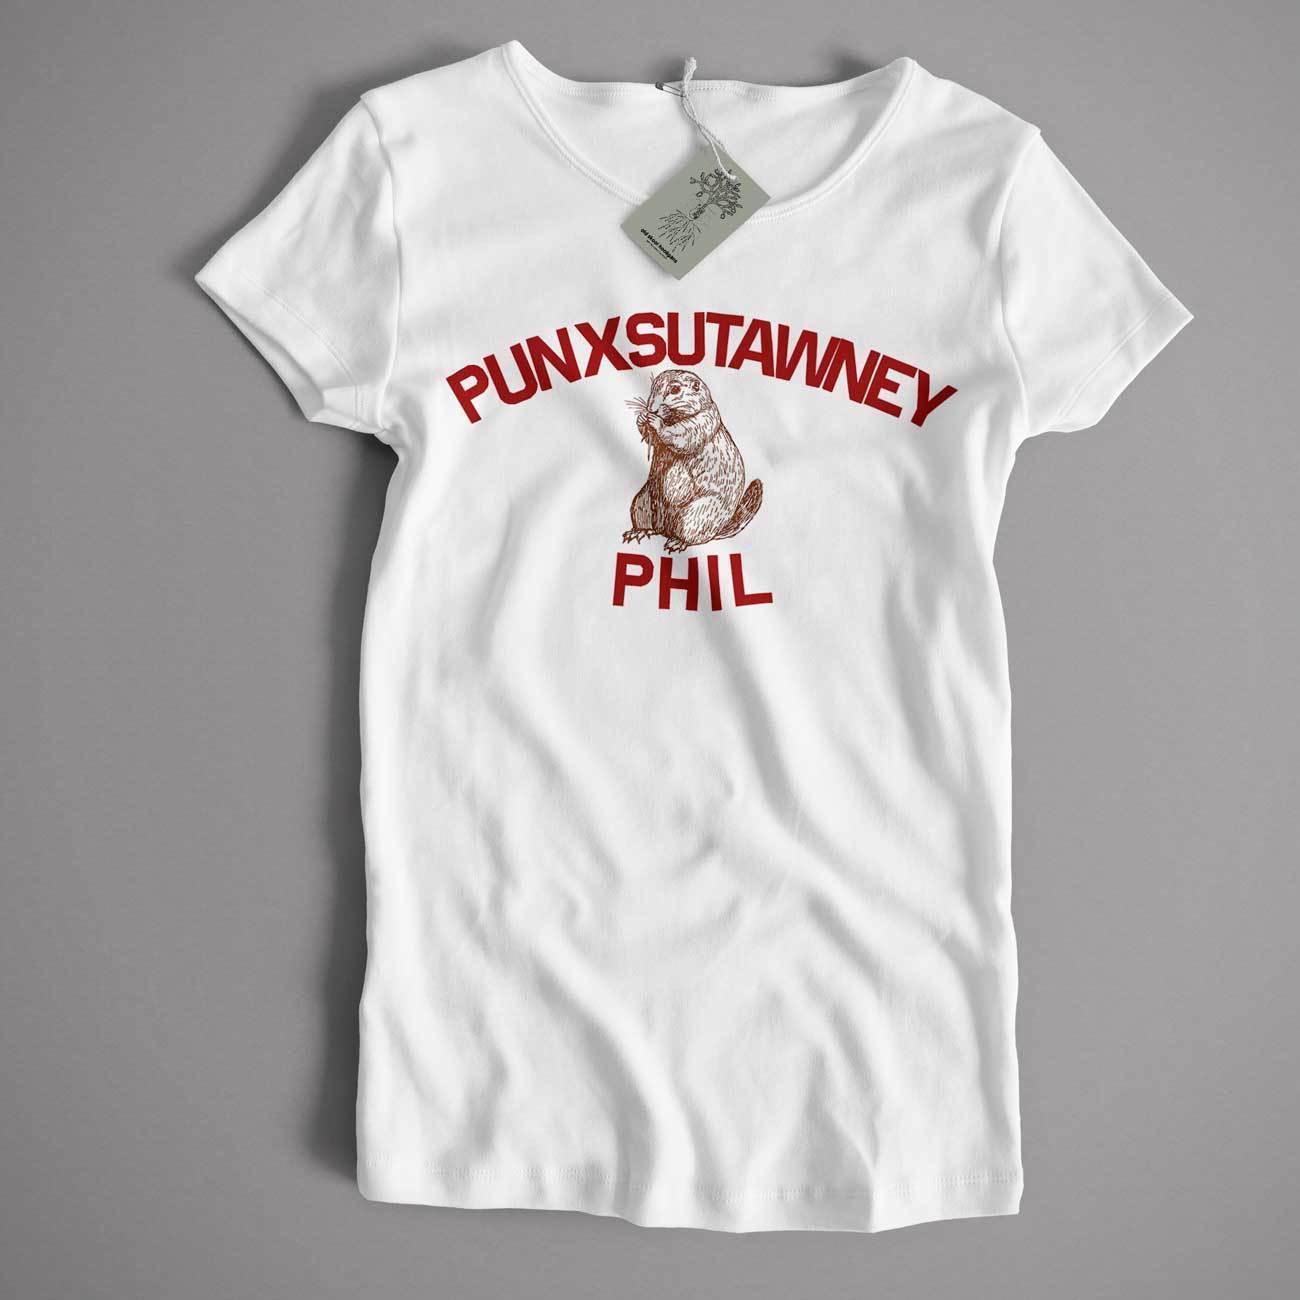 As Worn In Groundhog Day T Shirt - Punxsutawney Phil Cult Movie Comedy T shirt